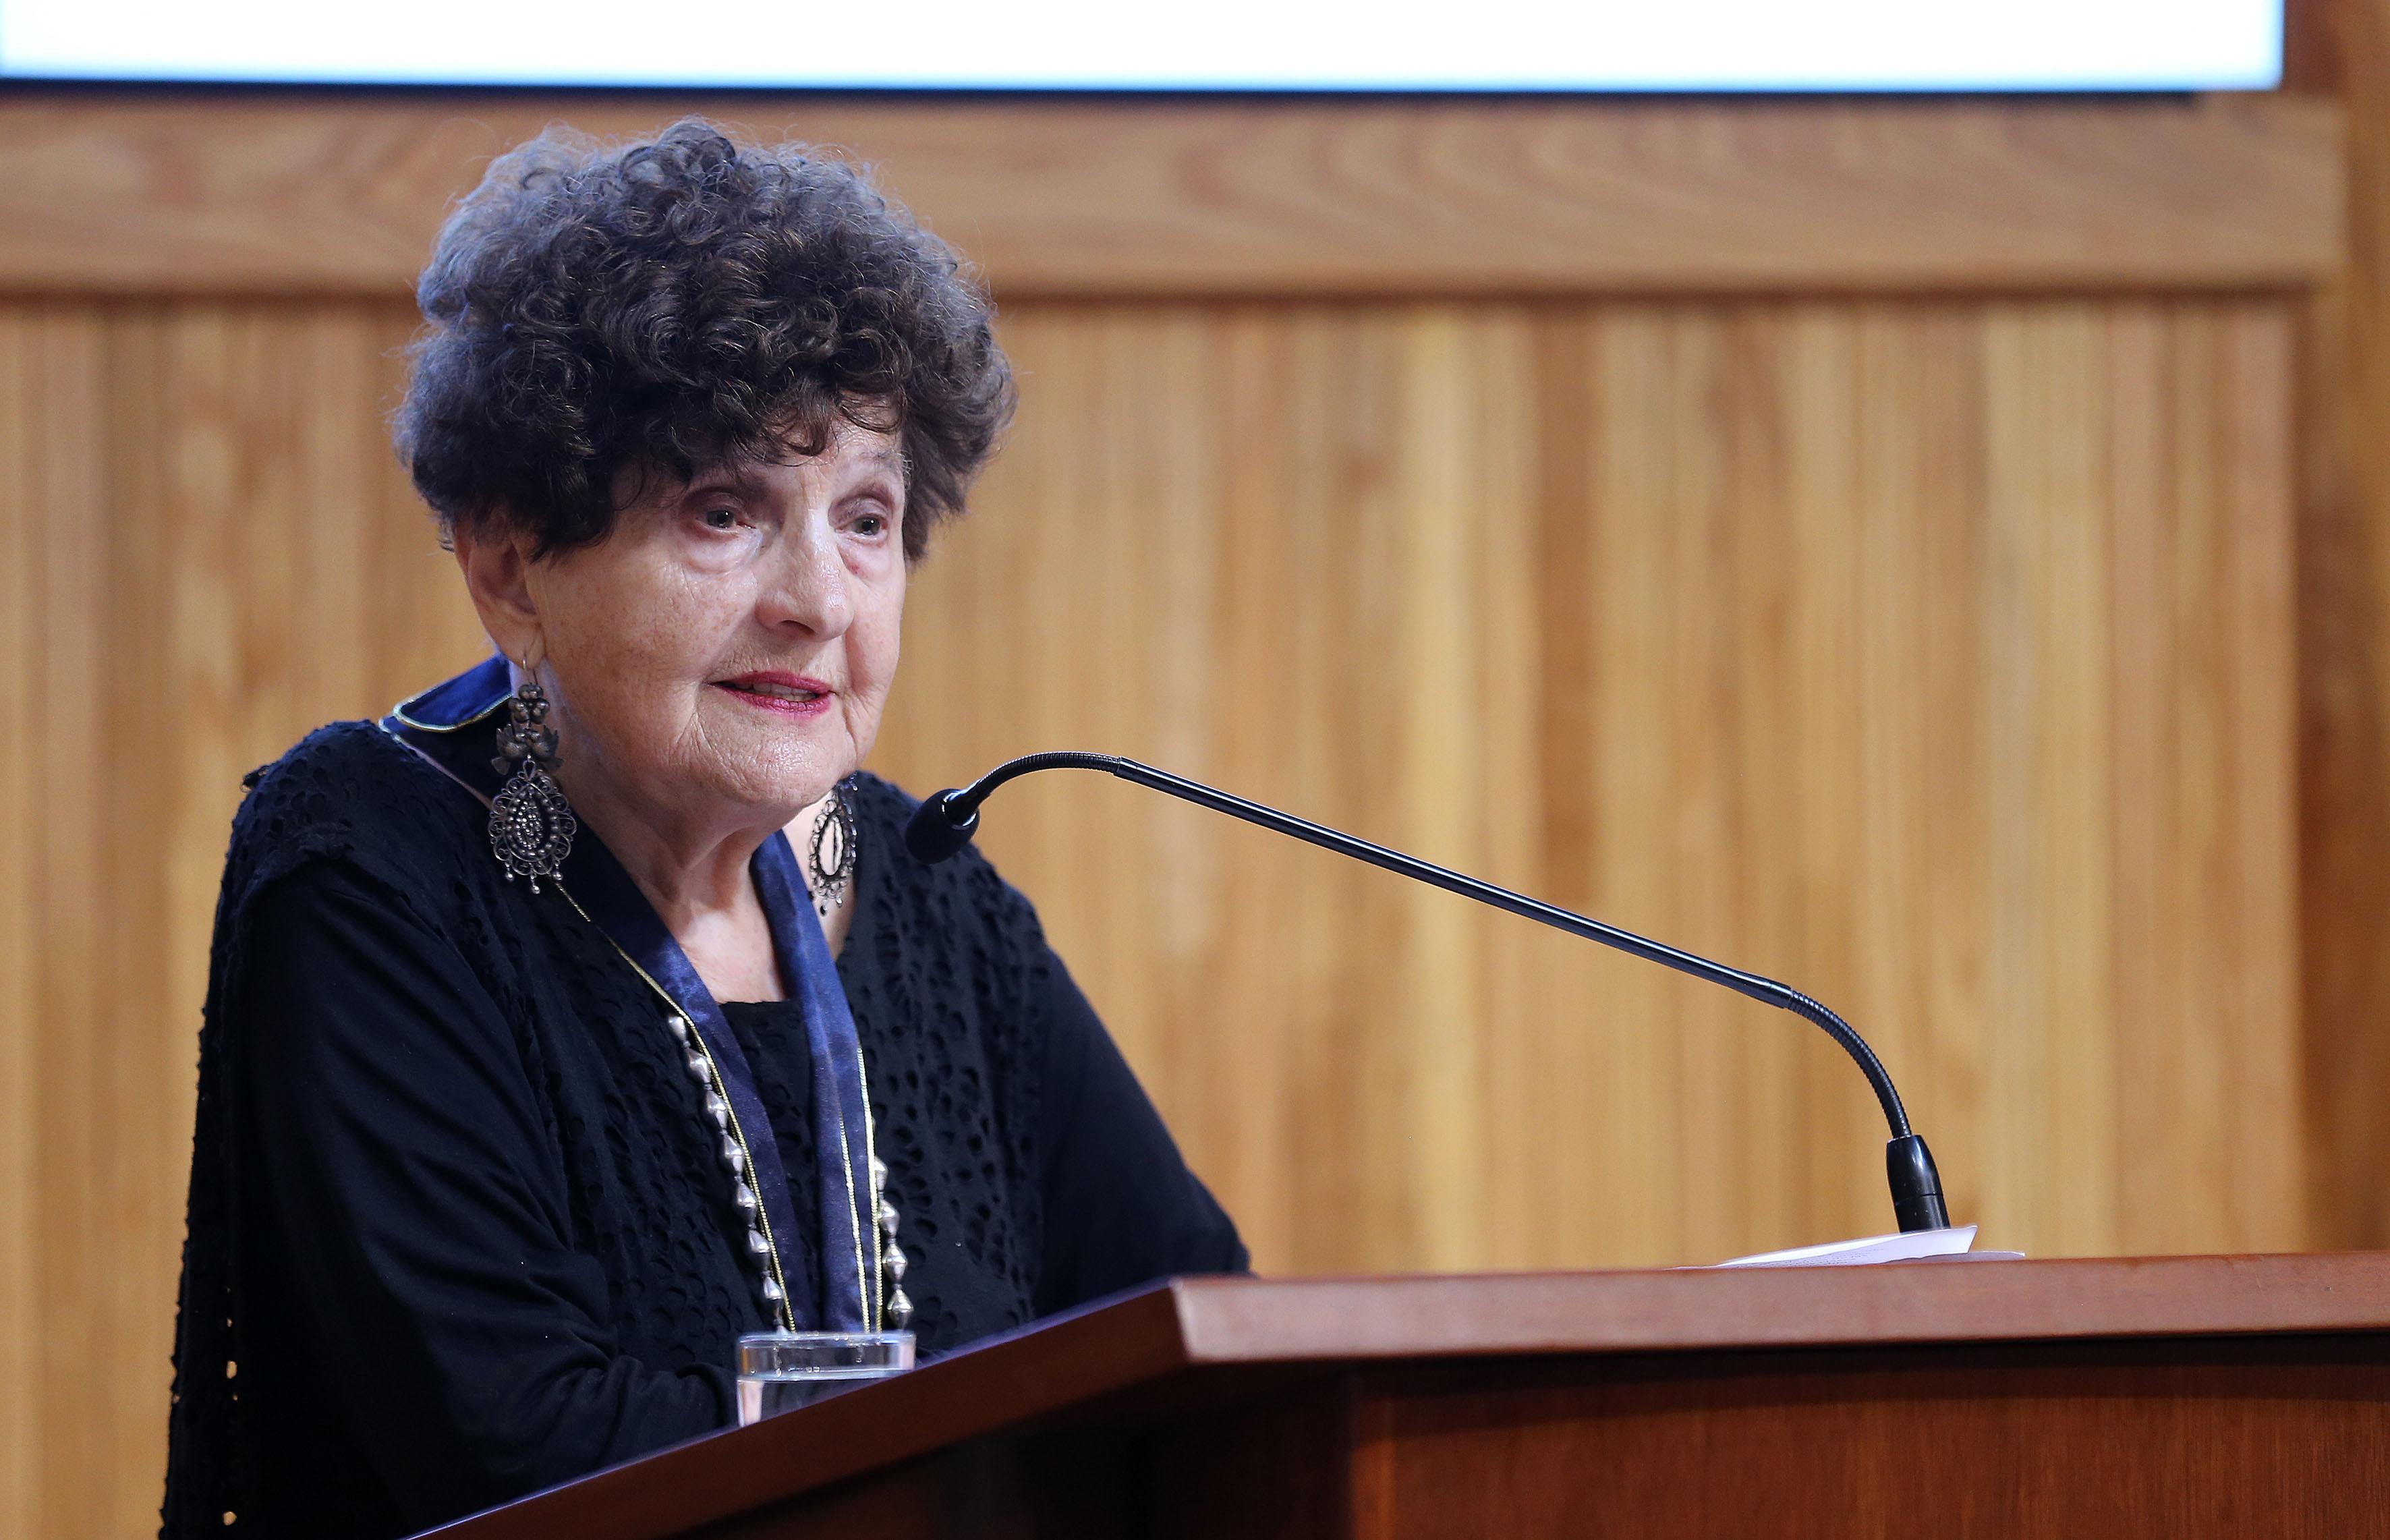 Escritora Margo Glantz Shapiro, haciendo uso de la palabra